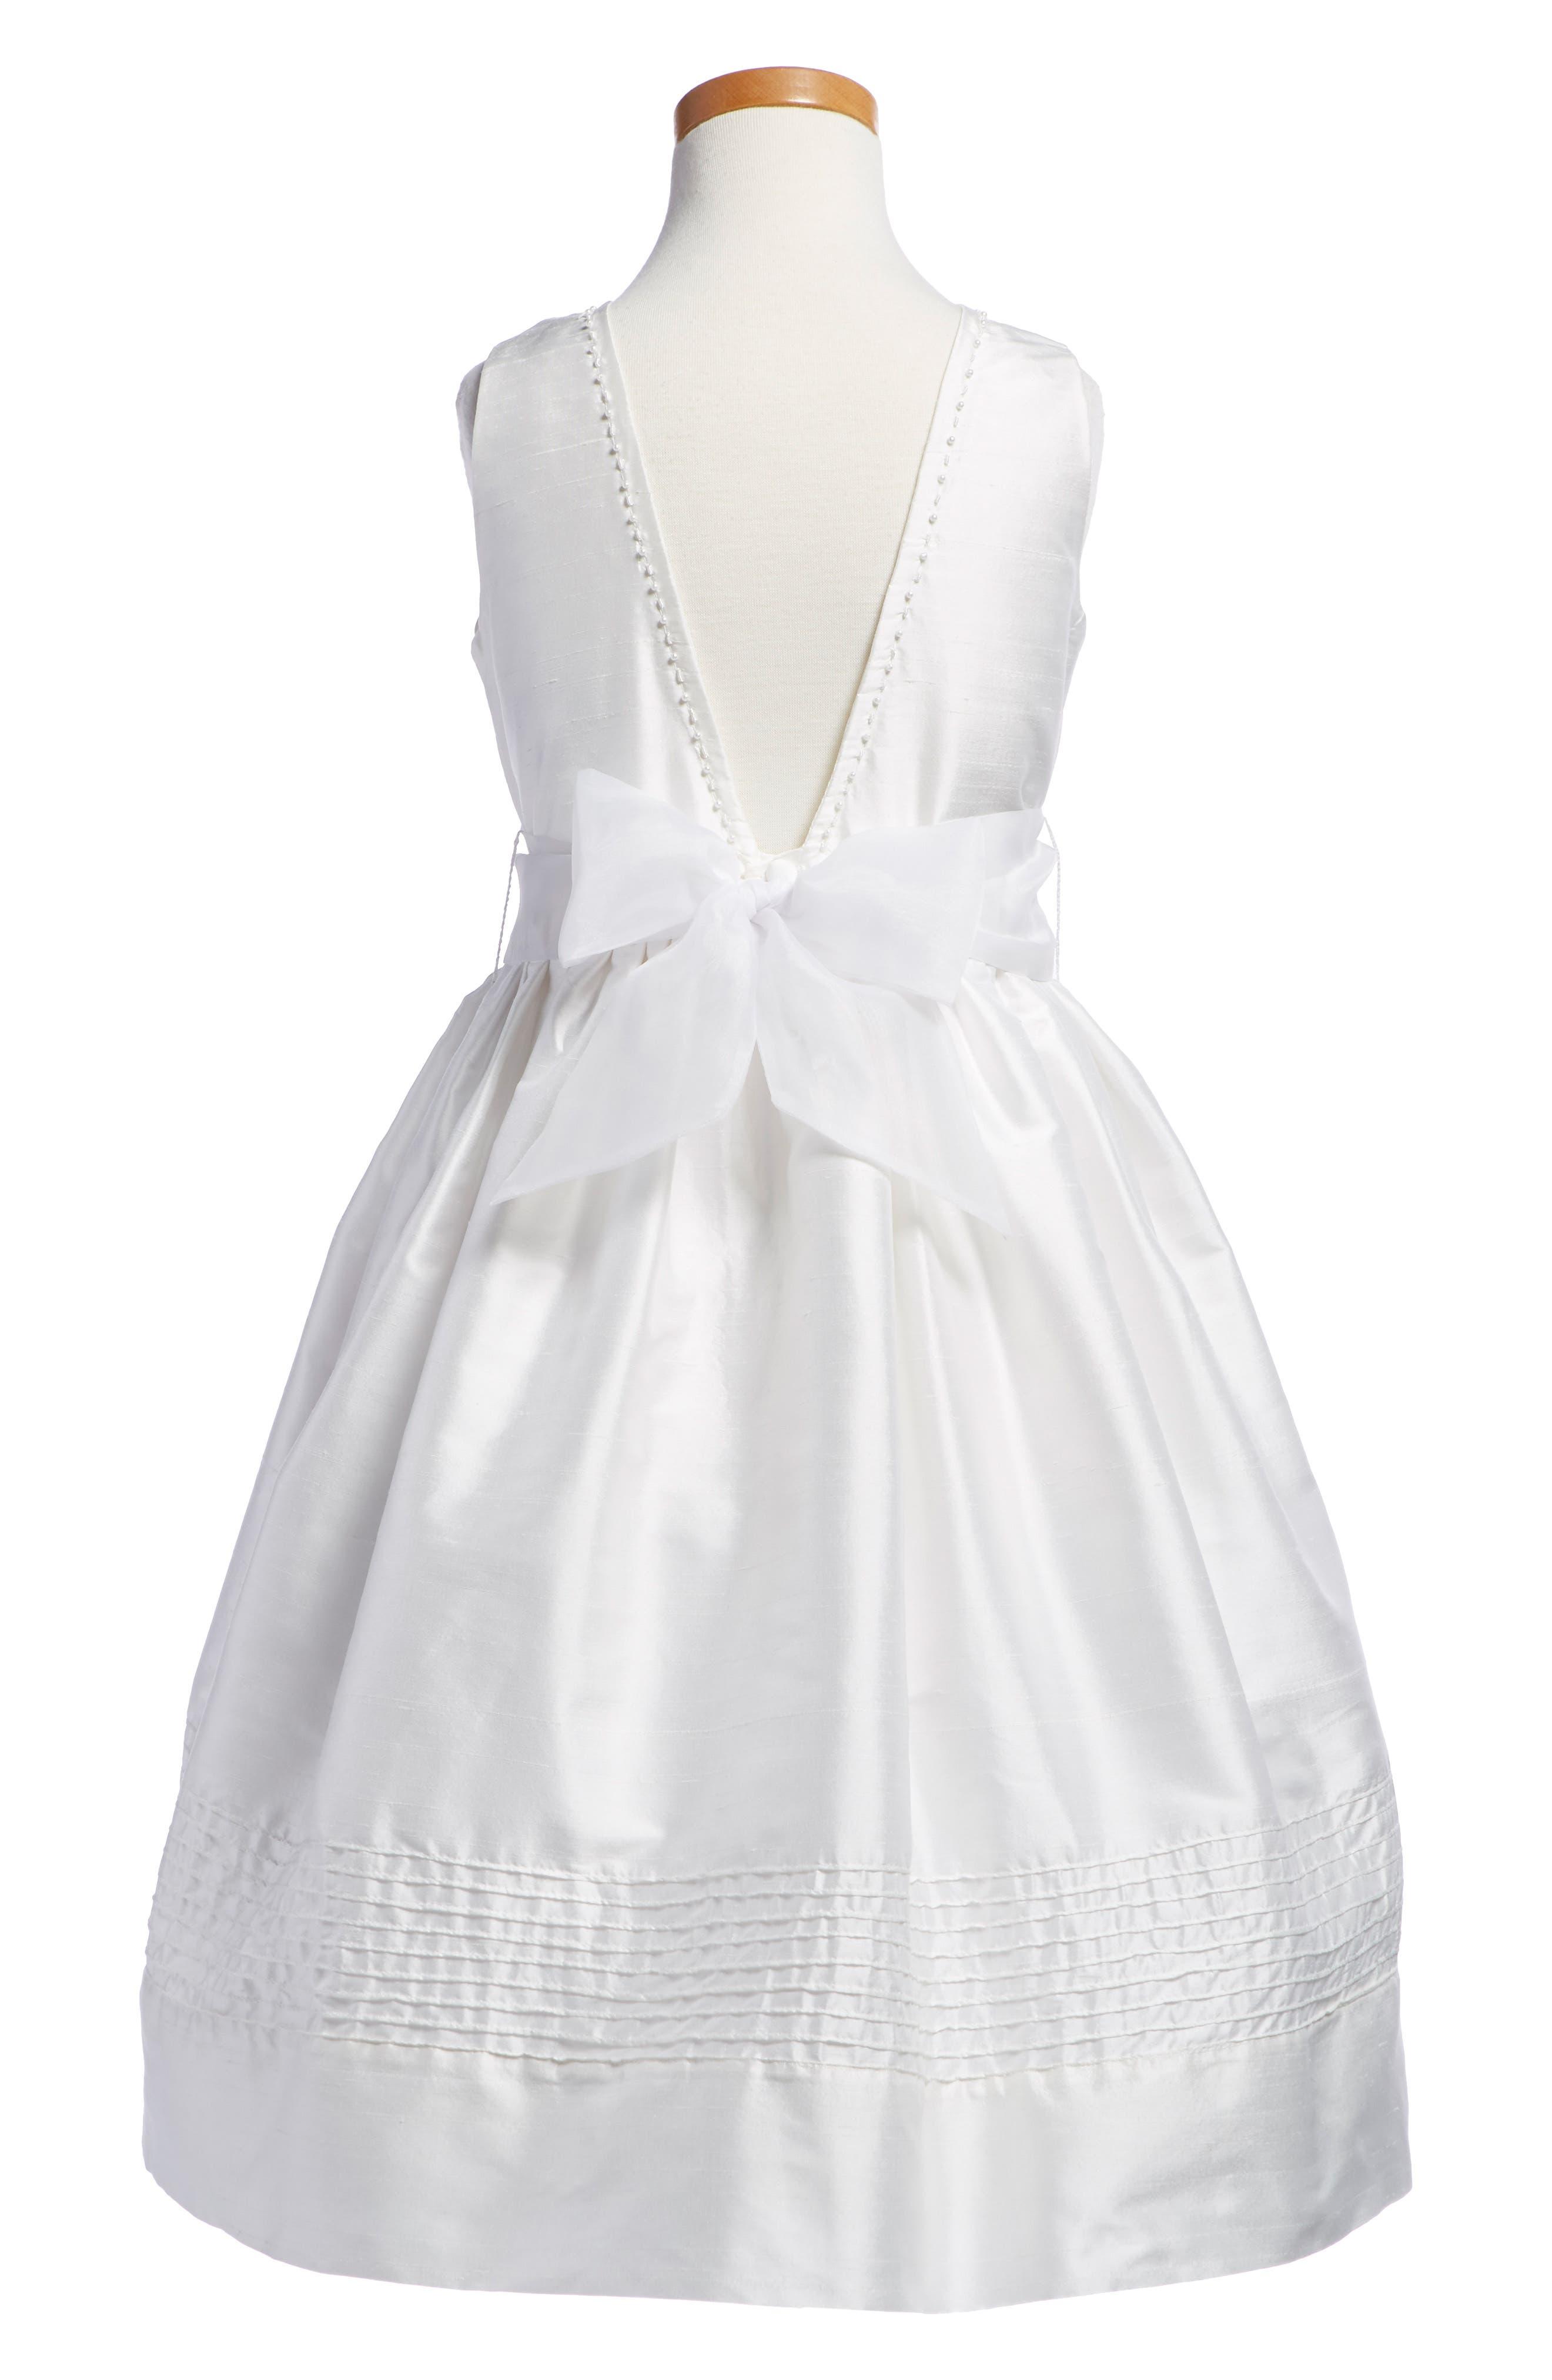 'Melody' Sleeveless Dress,                             Alternate thumbnail 3, color,                             105